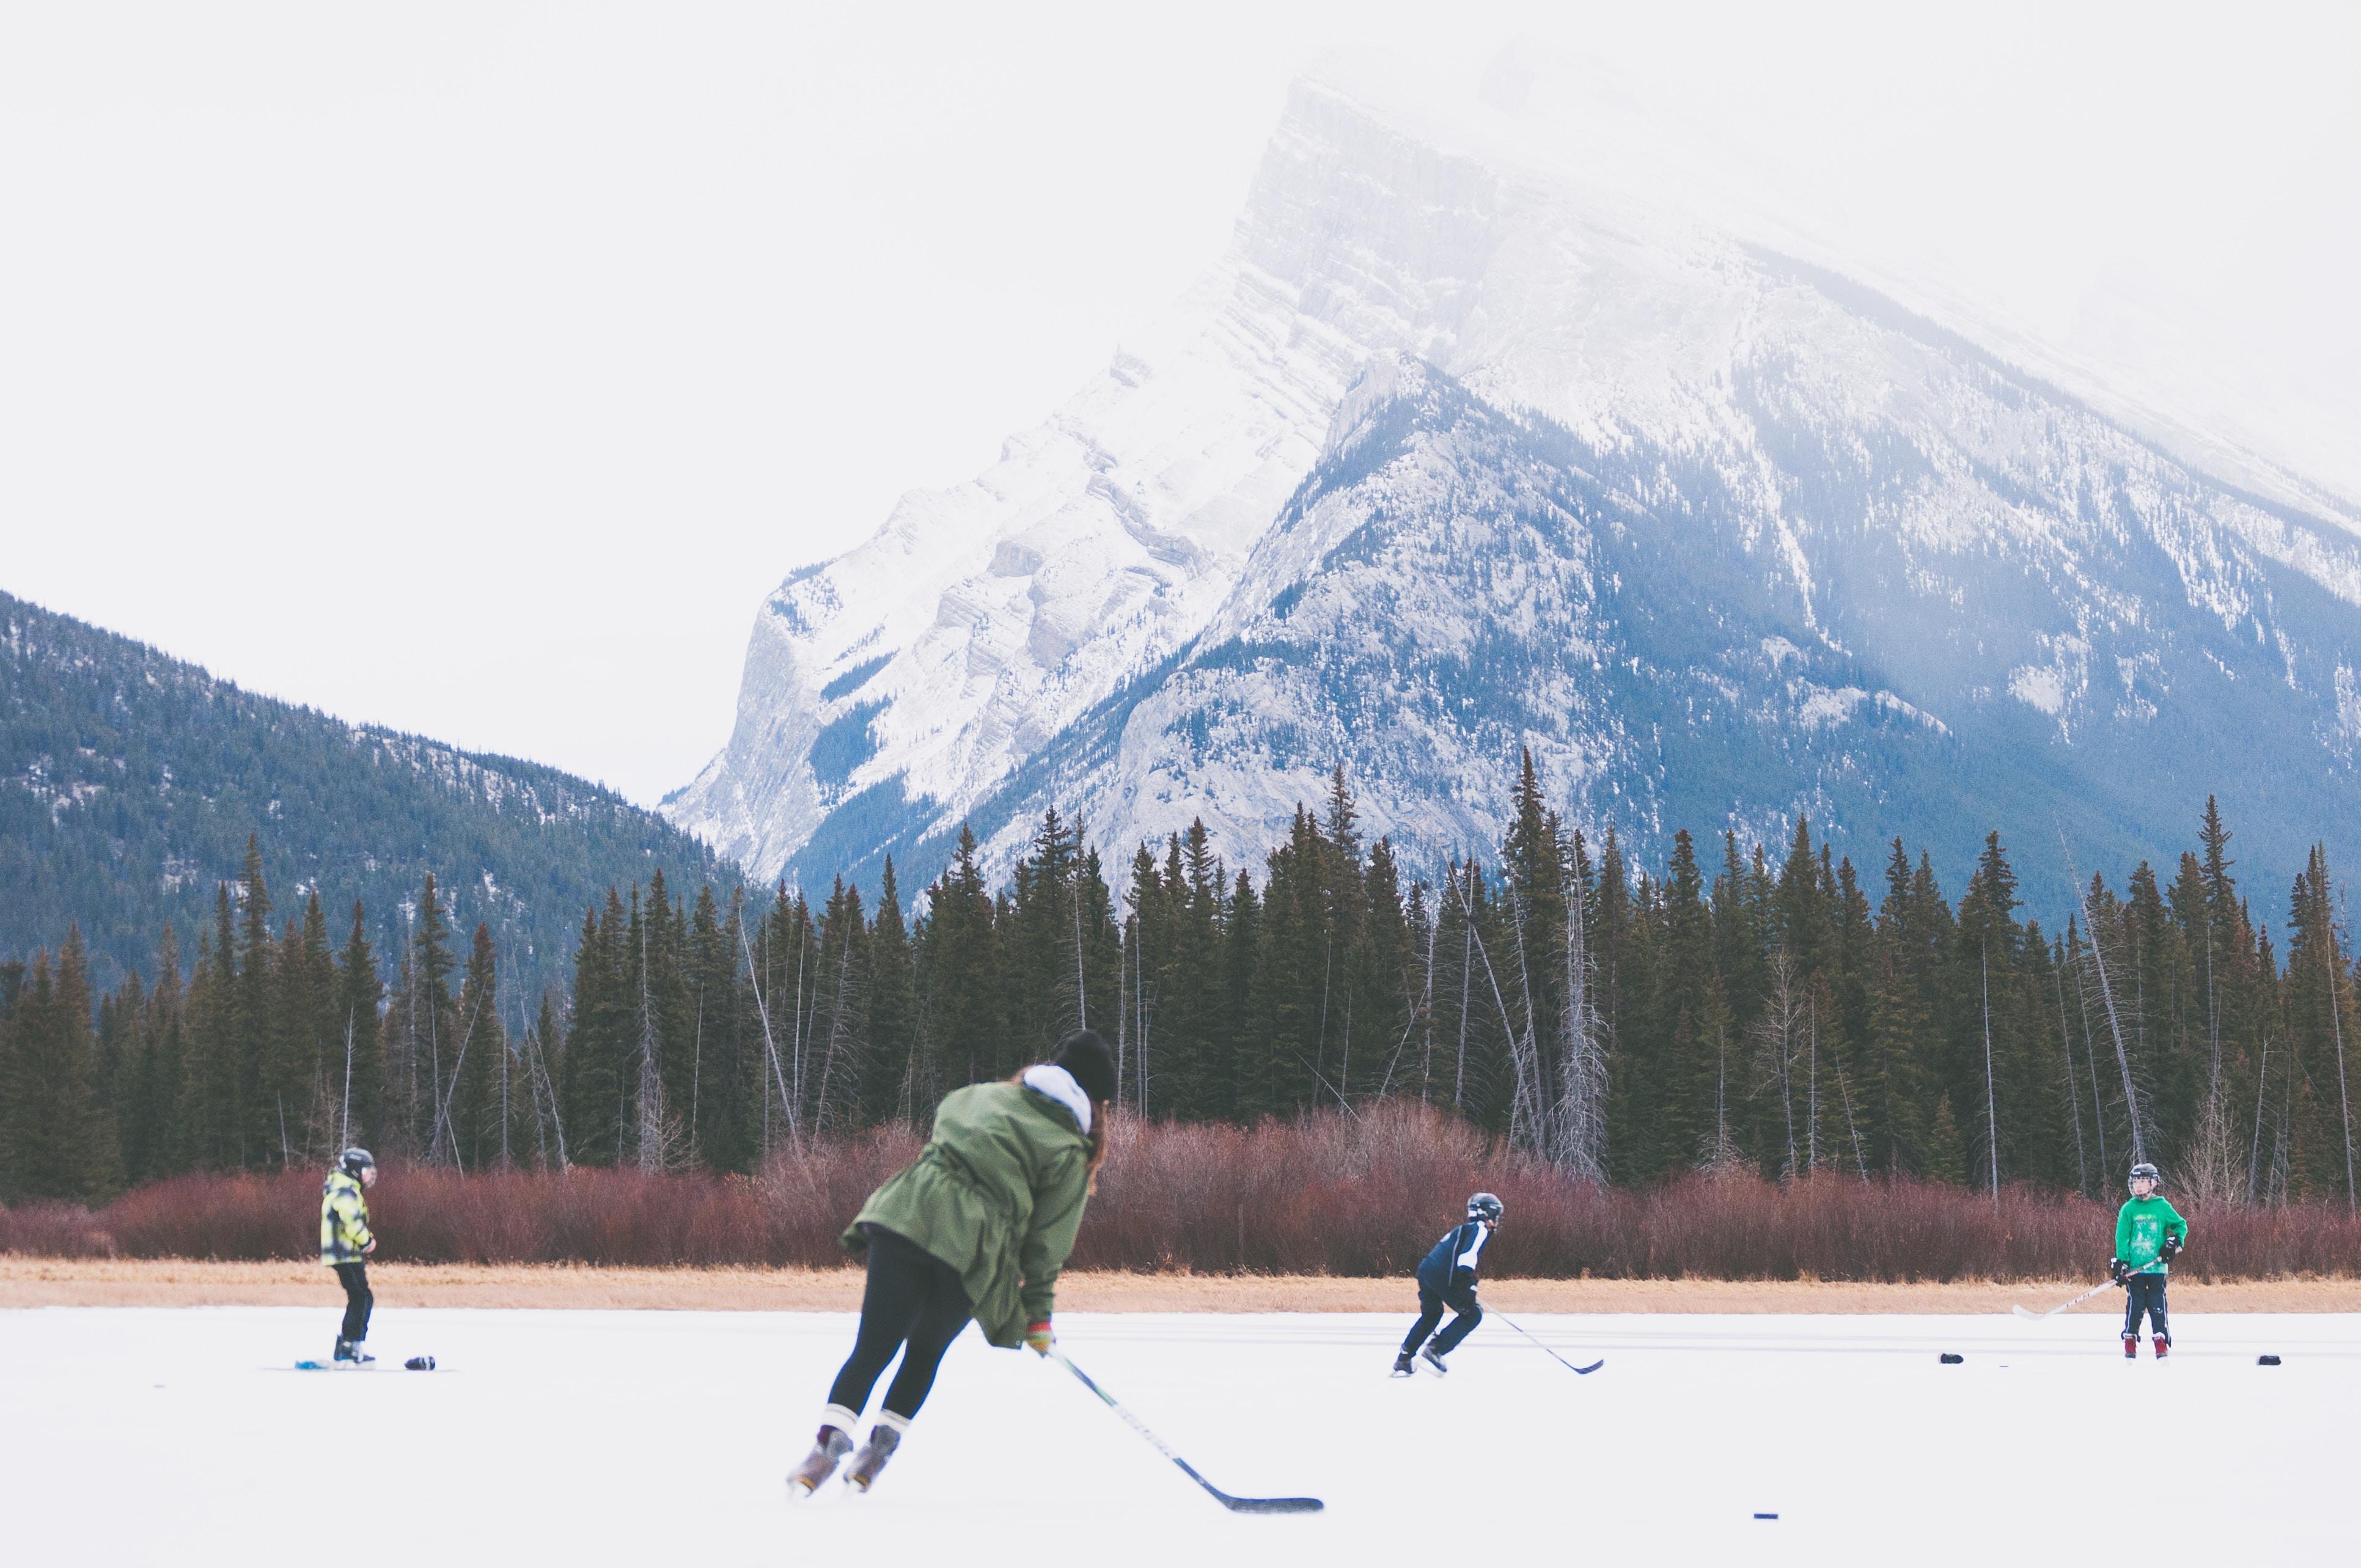 Children playing ice hockey in Banff National Park